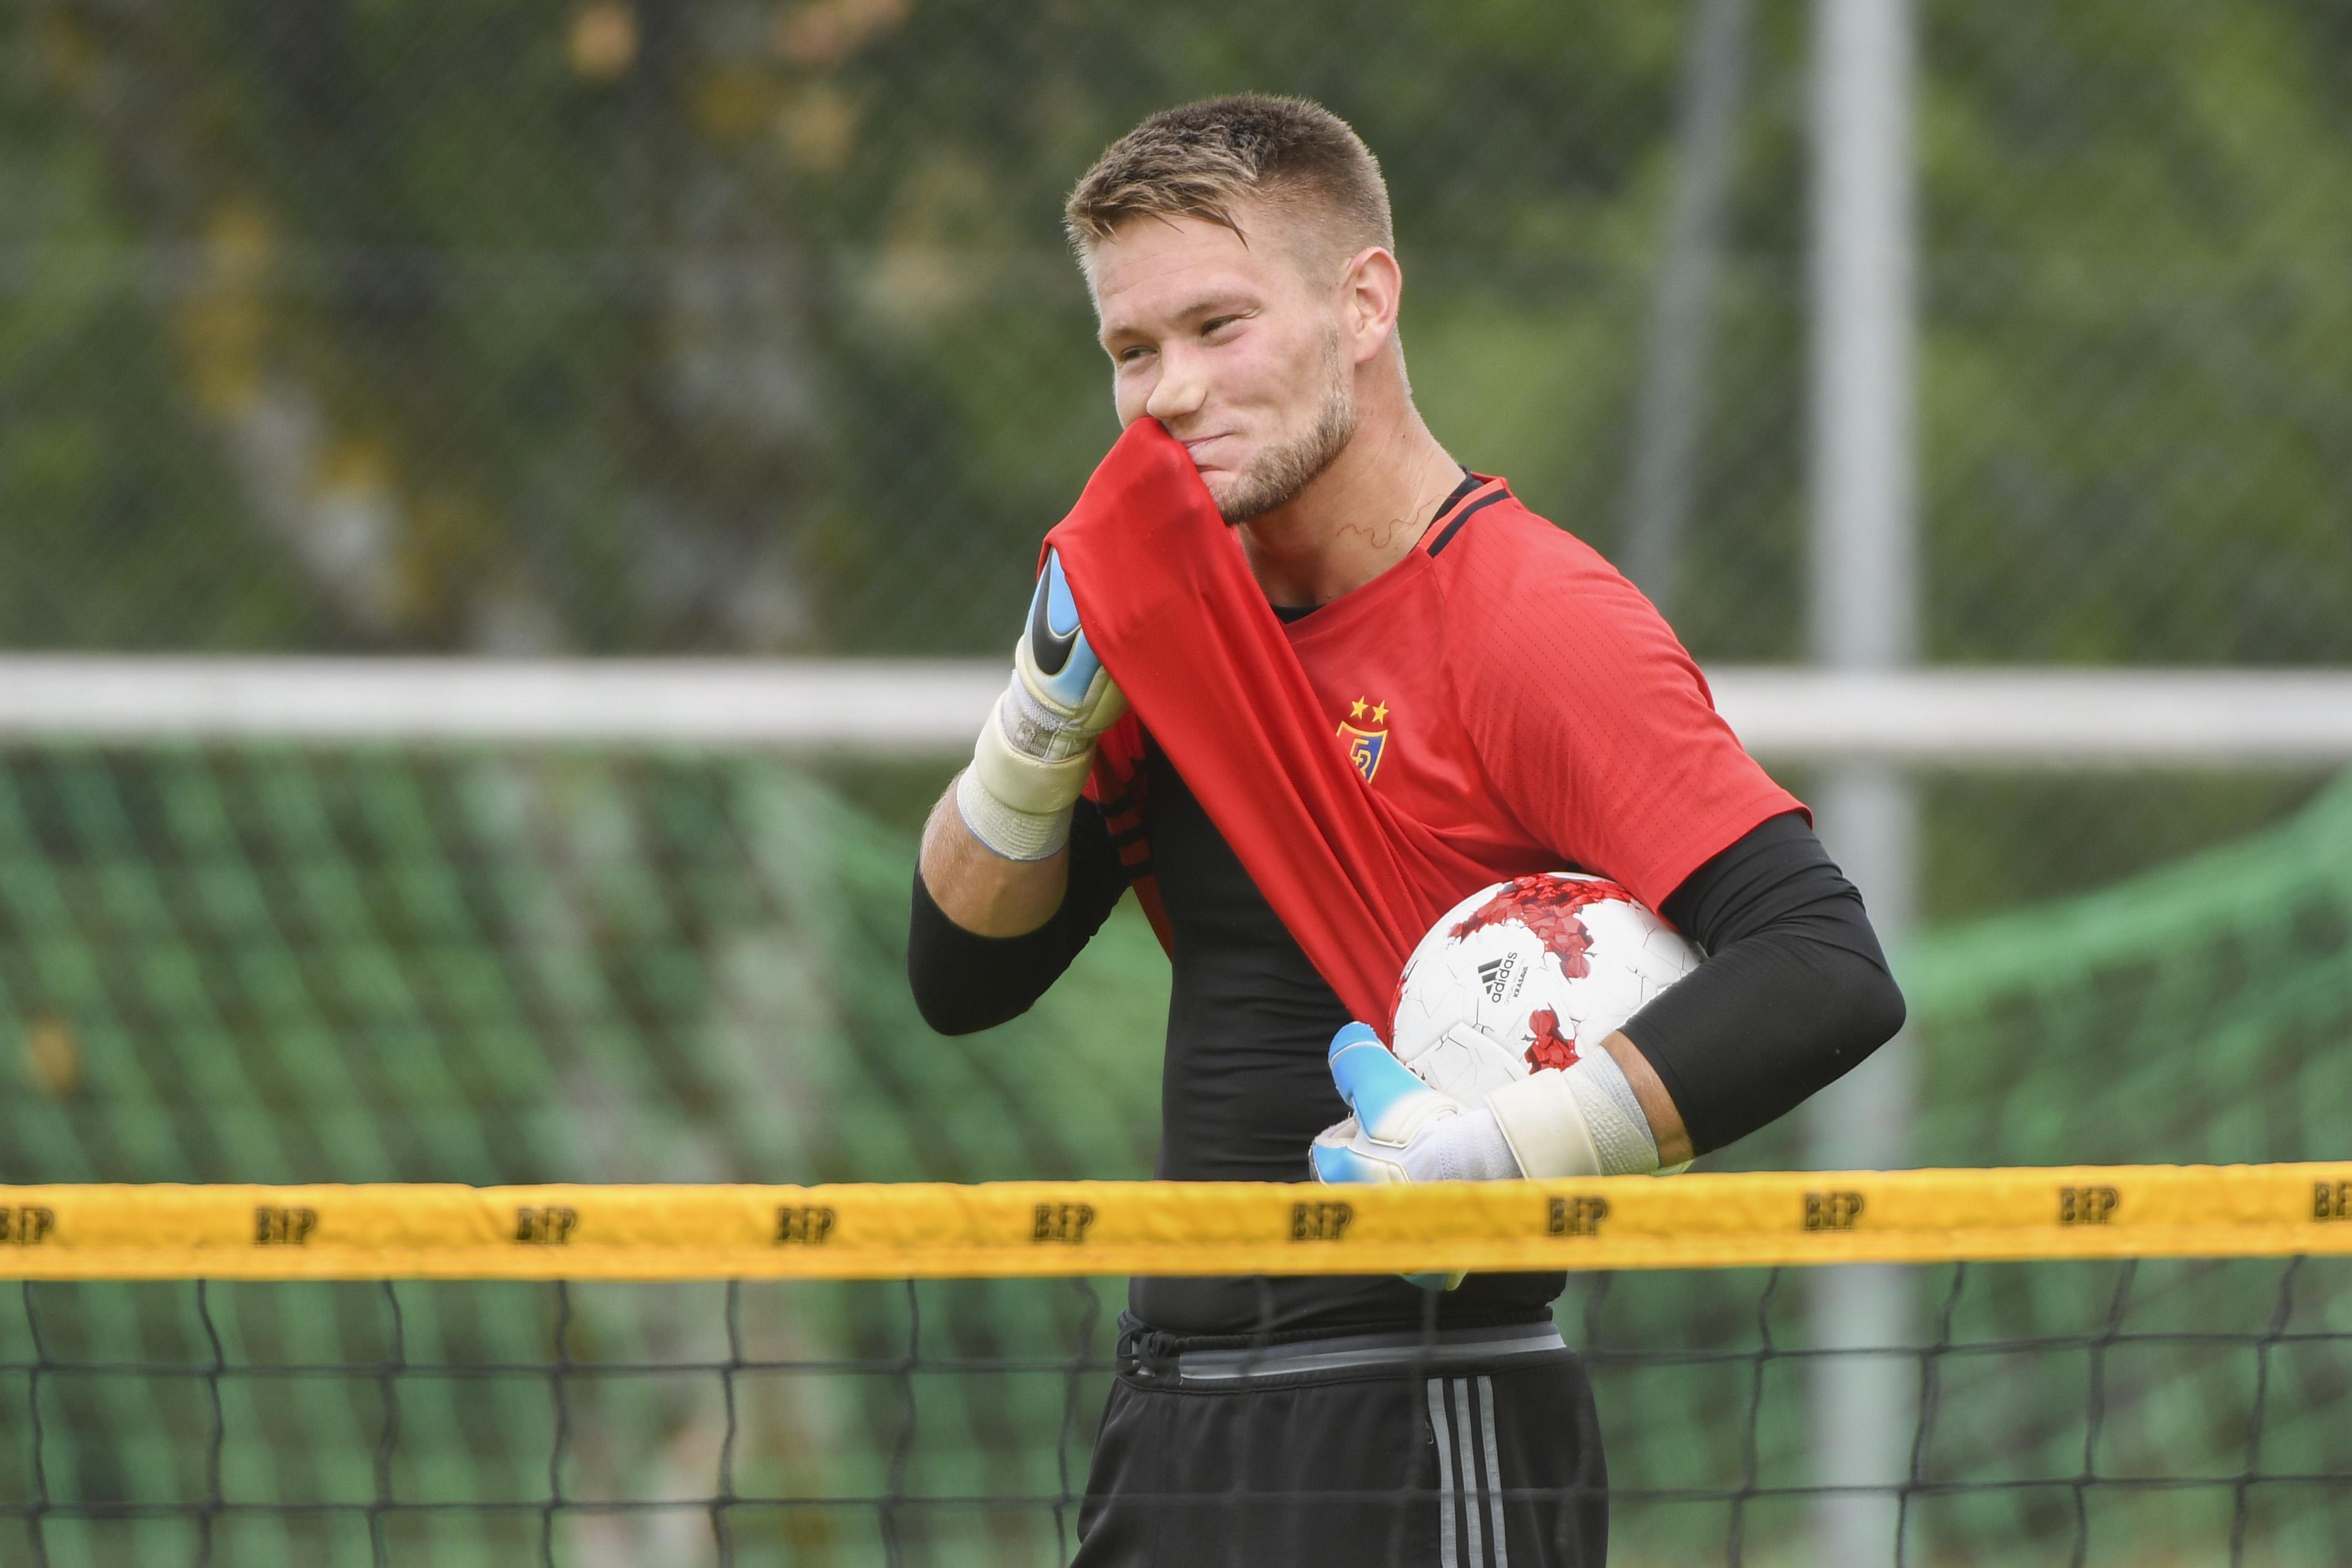 27.06.2017; Rottach-Egern; FUSSBALL SUPER LEAGUE - FC Basel Trainingslager - Training; Torhueter Tomas Vaclik (Basel) (Andy